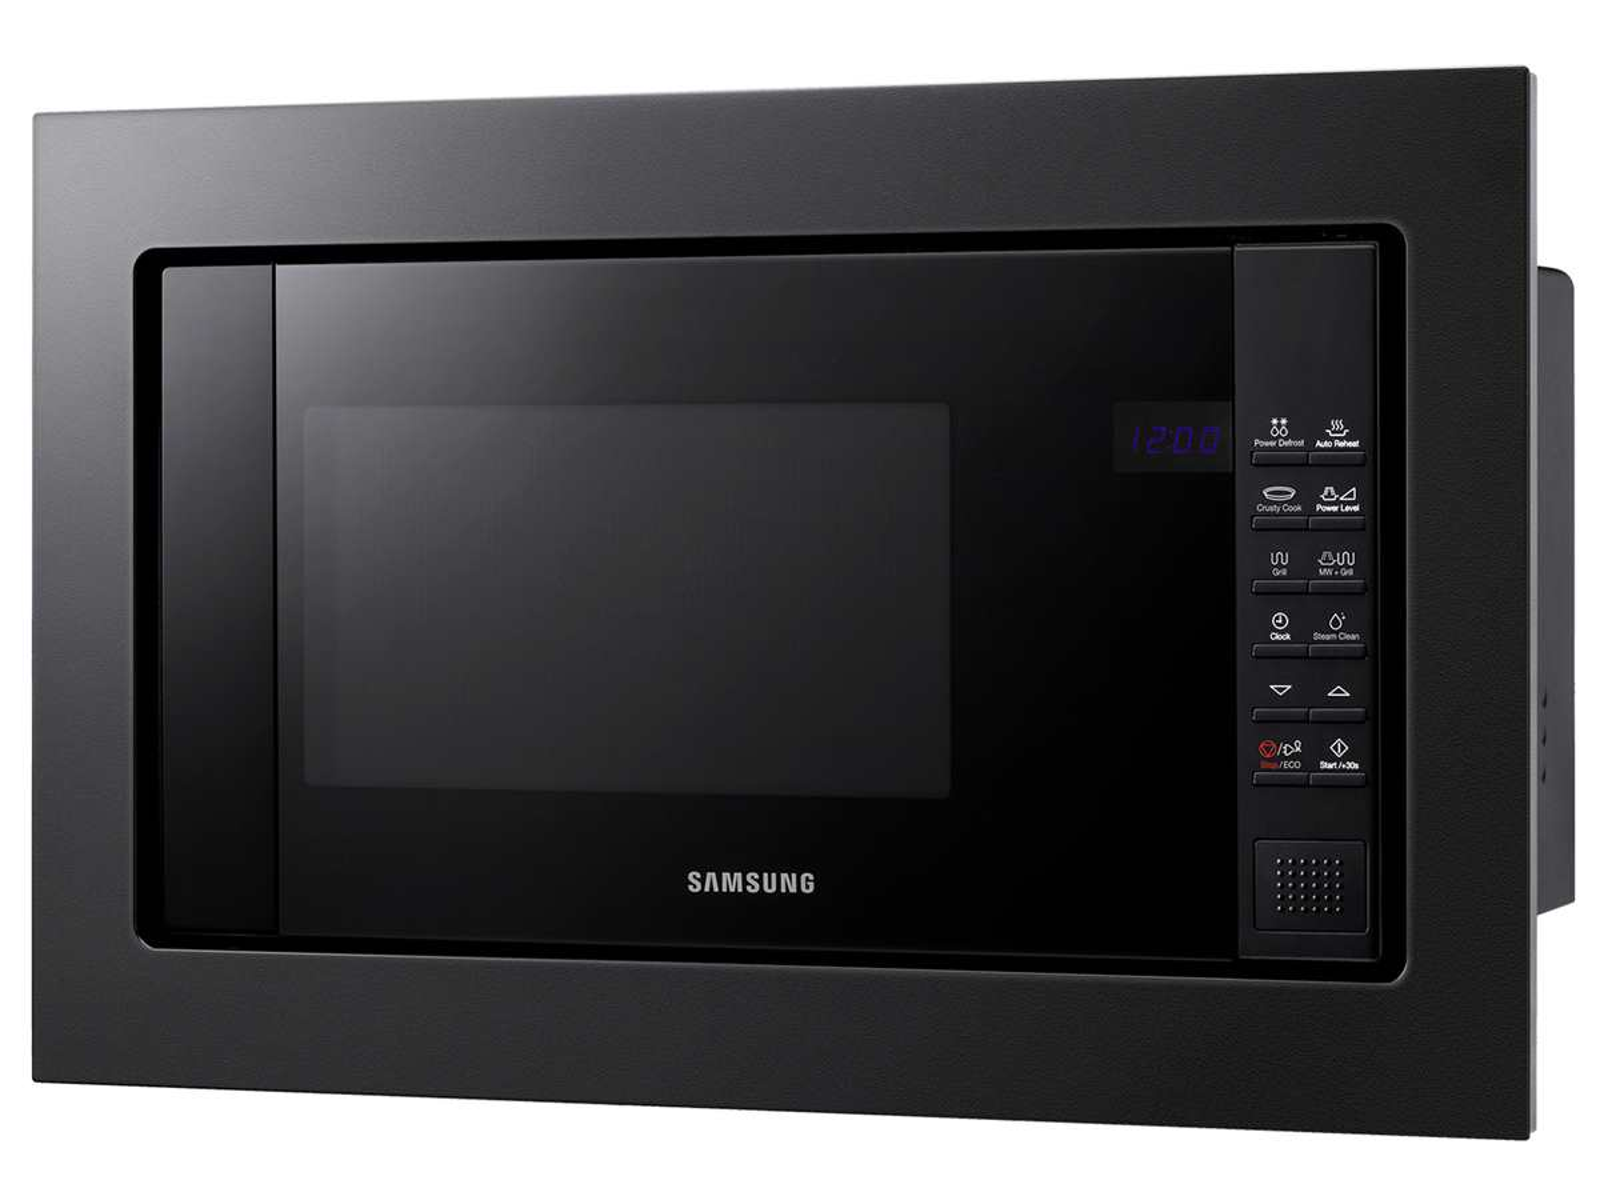 Samsung FG77SUB/XEG Einbau-Mikrowelle mit Grill Schwarz